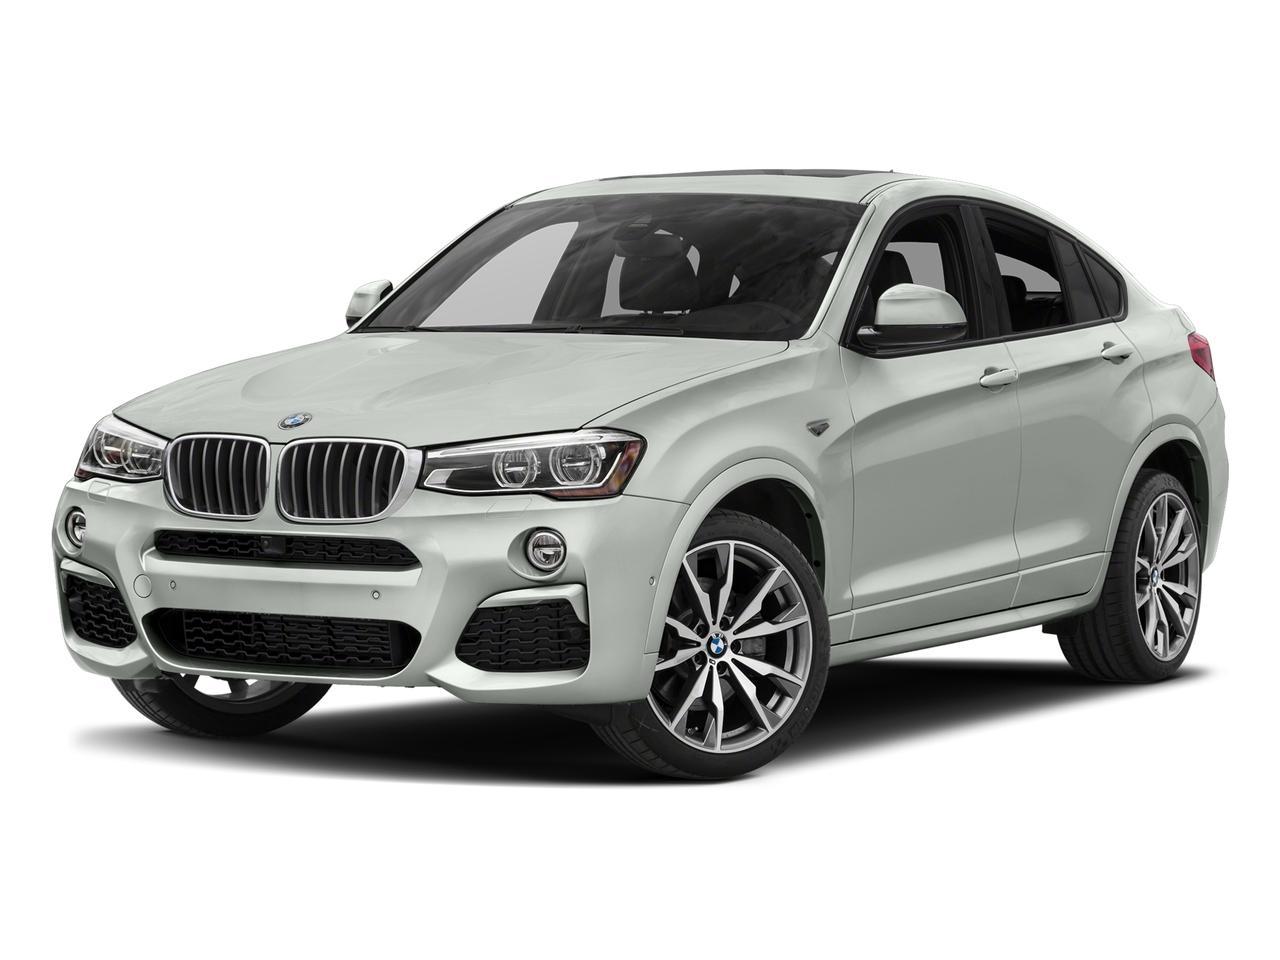 2017 BMW X4 xDrive28i Vehicle Photo in Charleston, SC 29407